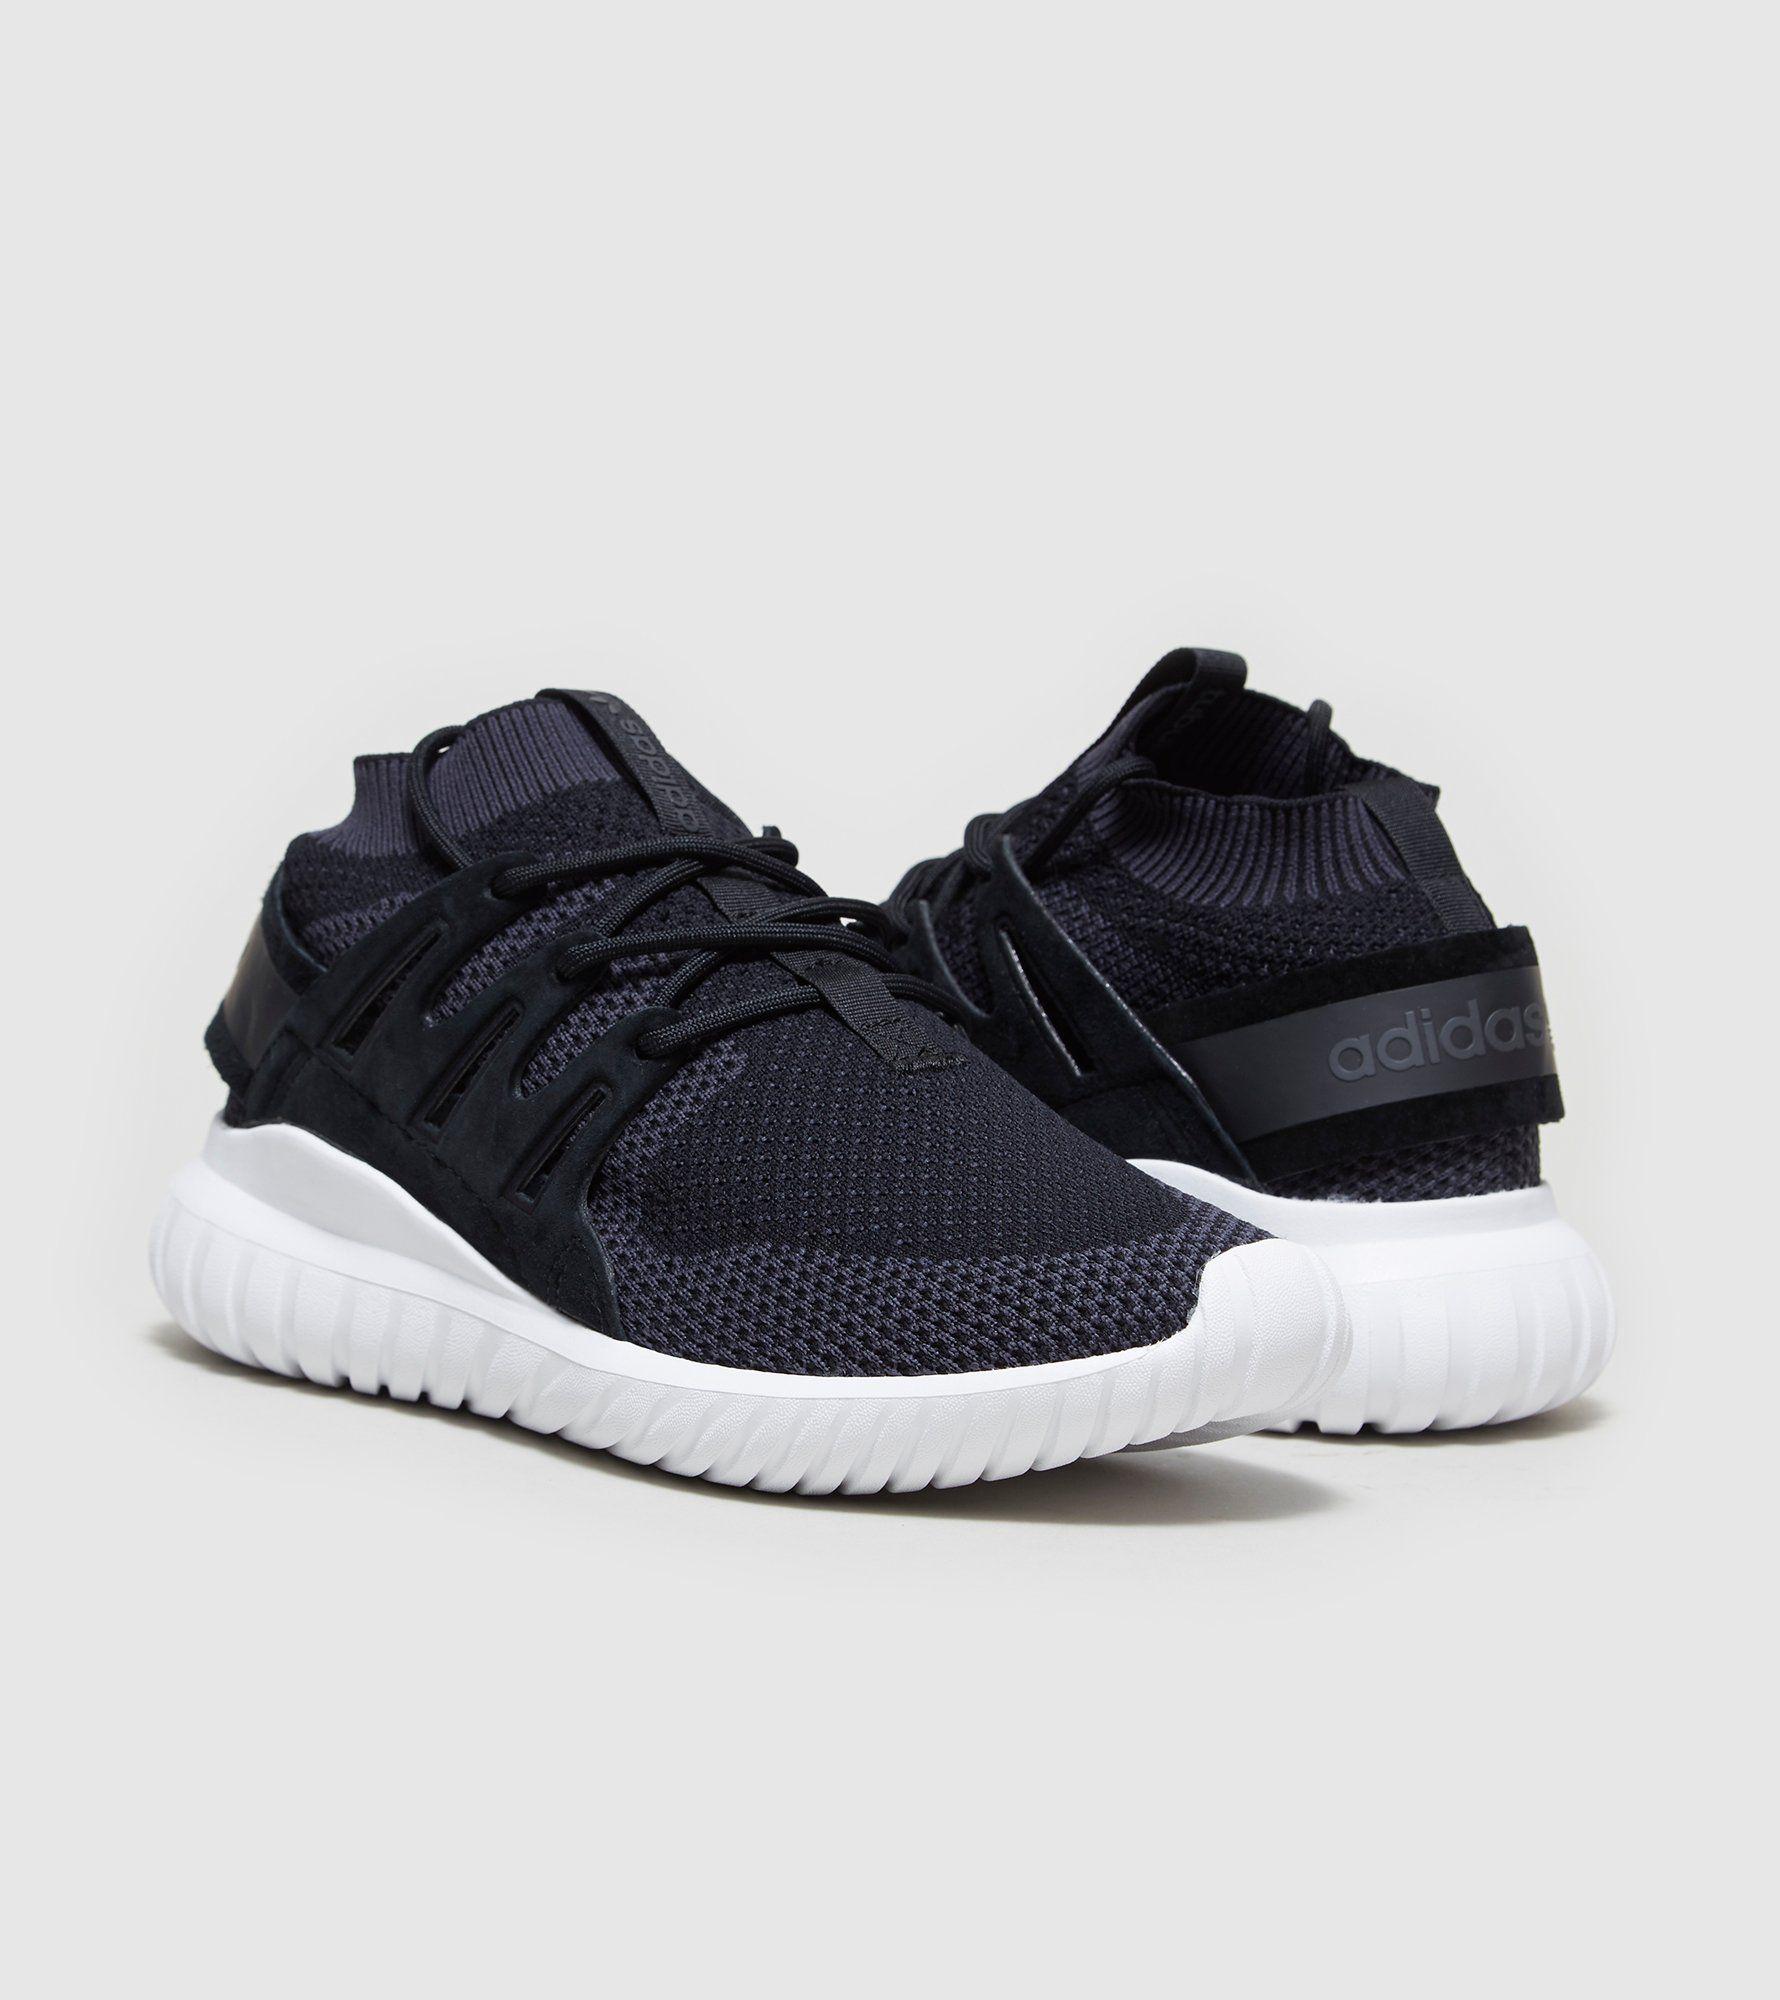 ¿Adidas Originals tubular Nova primeknit tamaño?